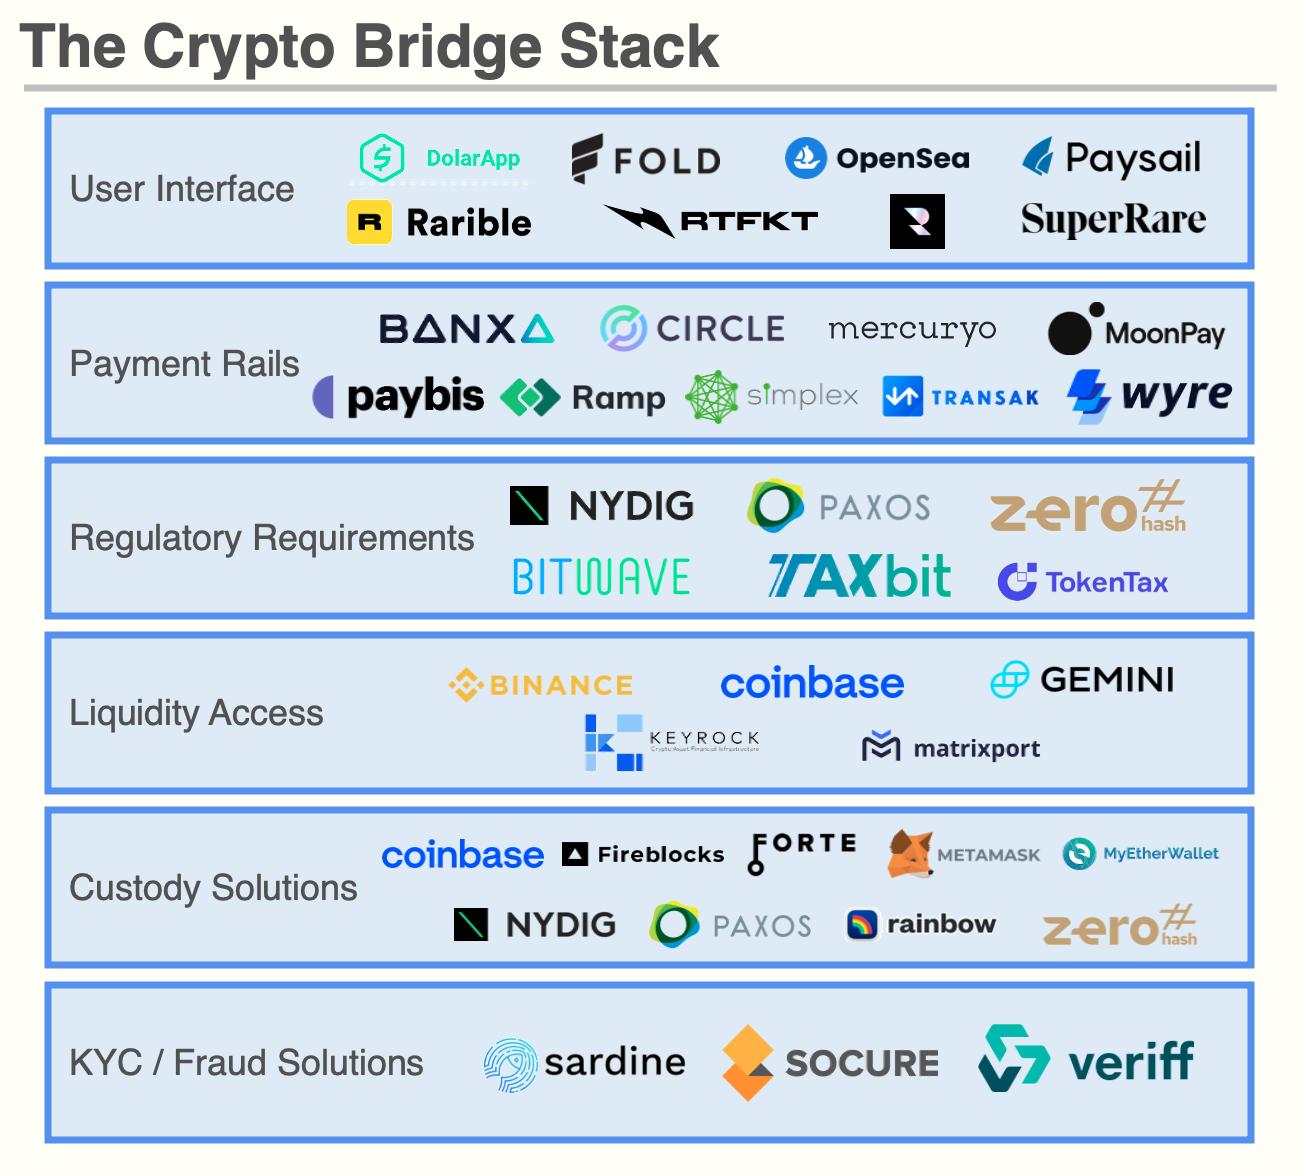 Market map of the Crypto Bridge Stack